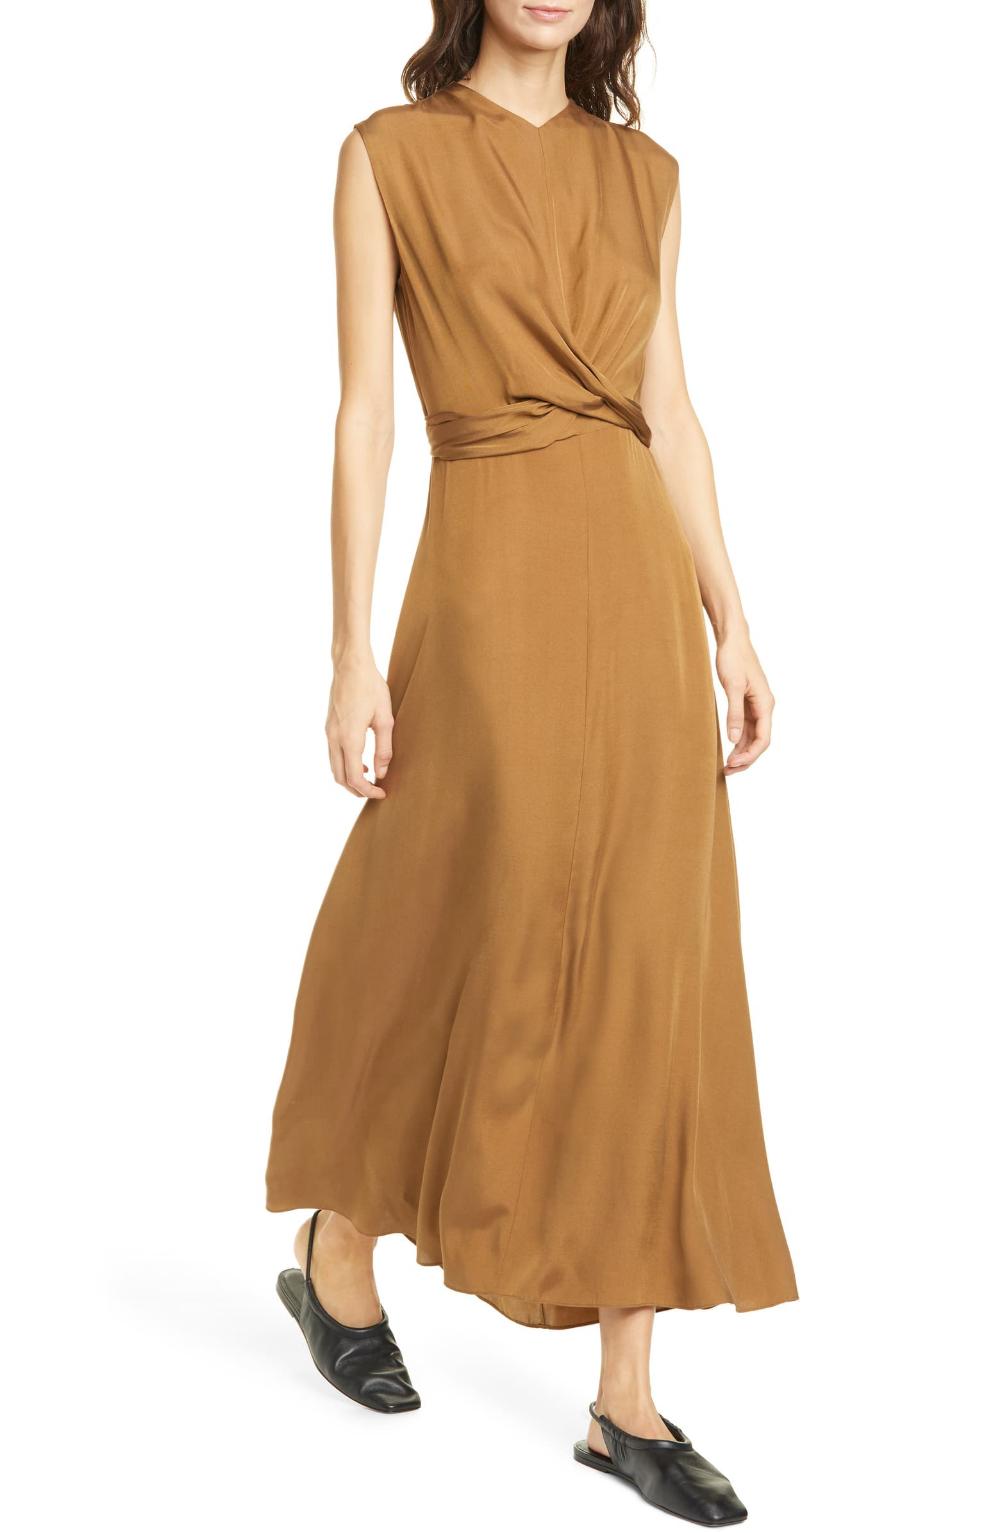 Vince Sleeveless Twist Front Dress Nordstrom Twist Front Dress Dresses Midi Dress With Sleeves [ 1533 x 1000 Pixel ]